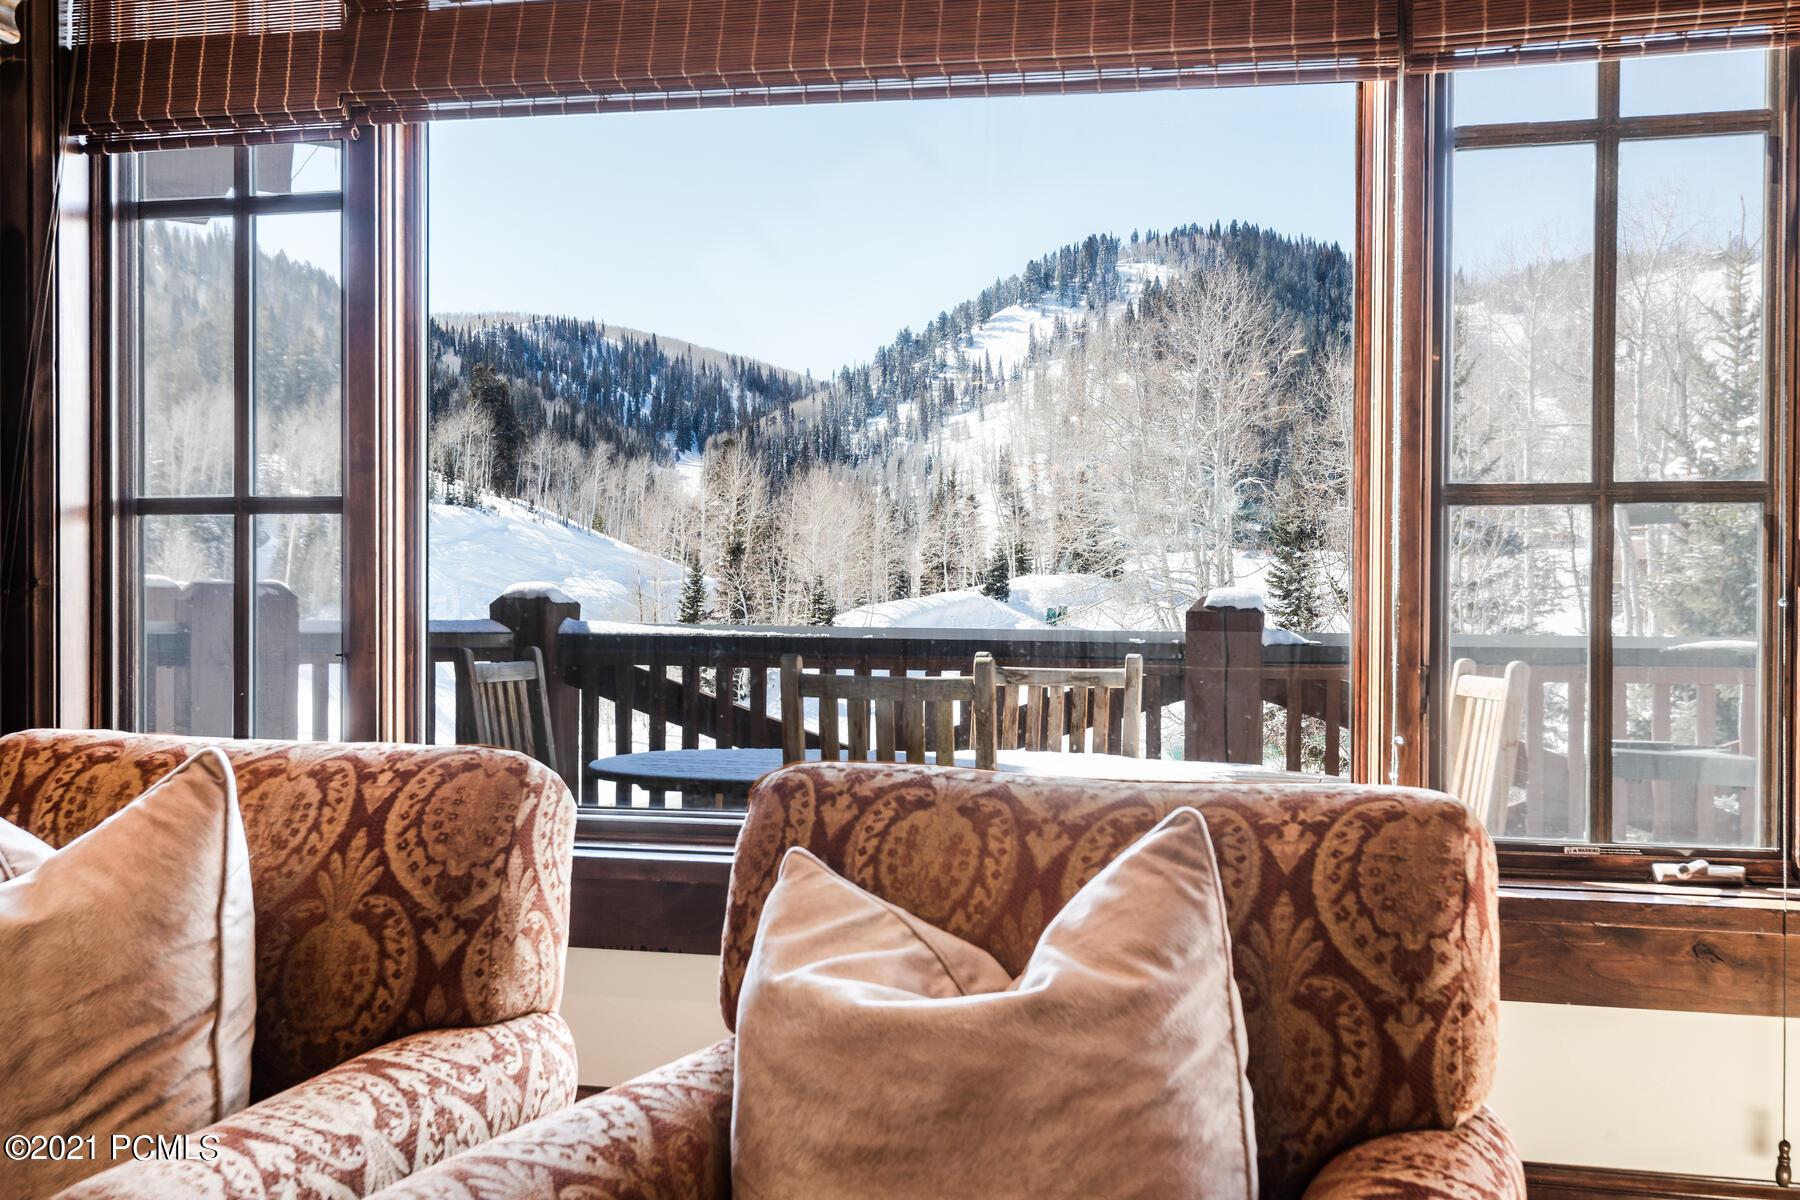 7560 Royal St, Park City, Utah 84060, 4 Bedrooms Bedrooms, ,6 BathroomsBathrooms,Condominium,For Sale,Royal St,12004942